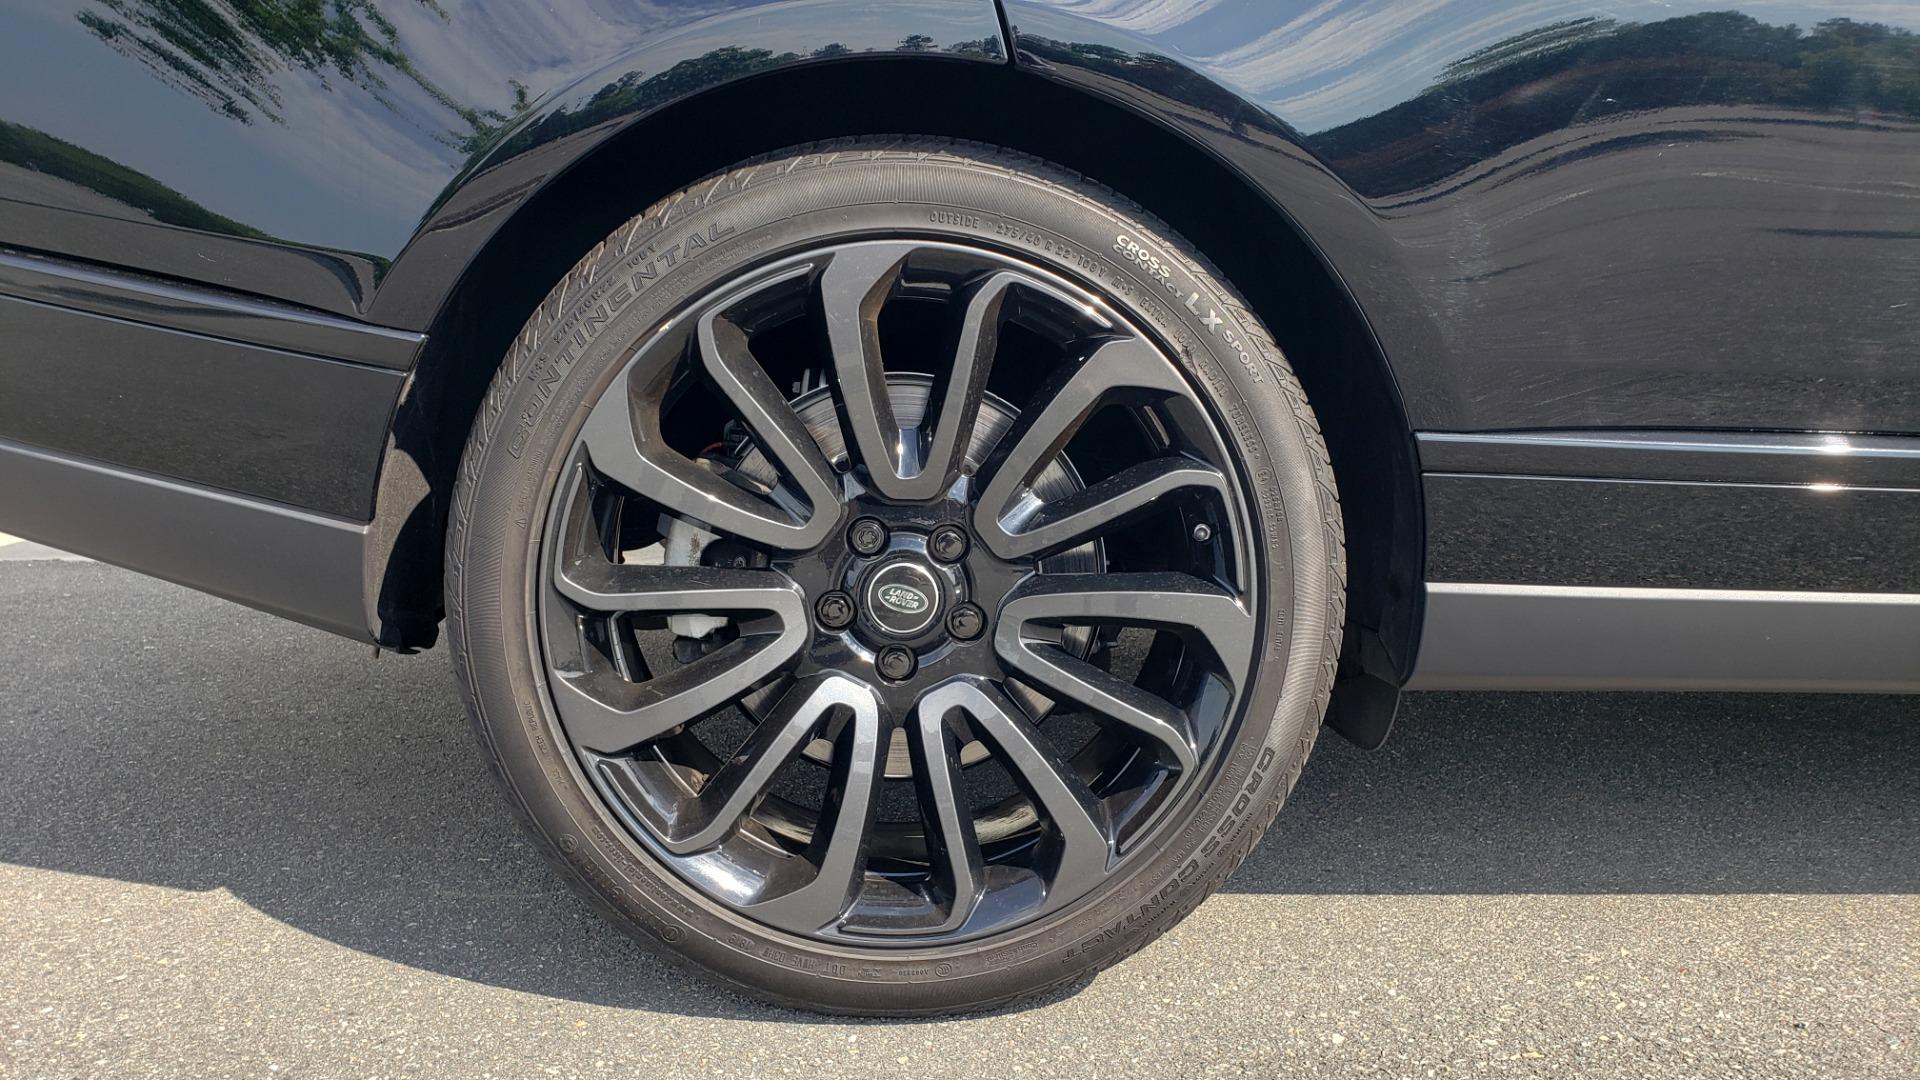 Used 2017 Land Rover RANGE ROVER SC V8 / VISION ASST / DRIVE PKG / MERIDIAN SOUND / PANO-ROOF / NAV / BSM for sale $75,995 at Formula Imports in Charlotte NC 28227 89